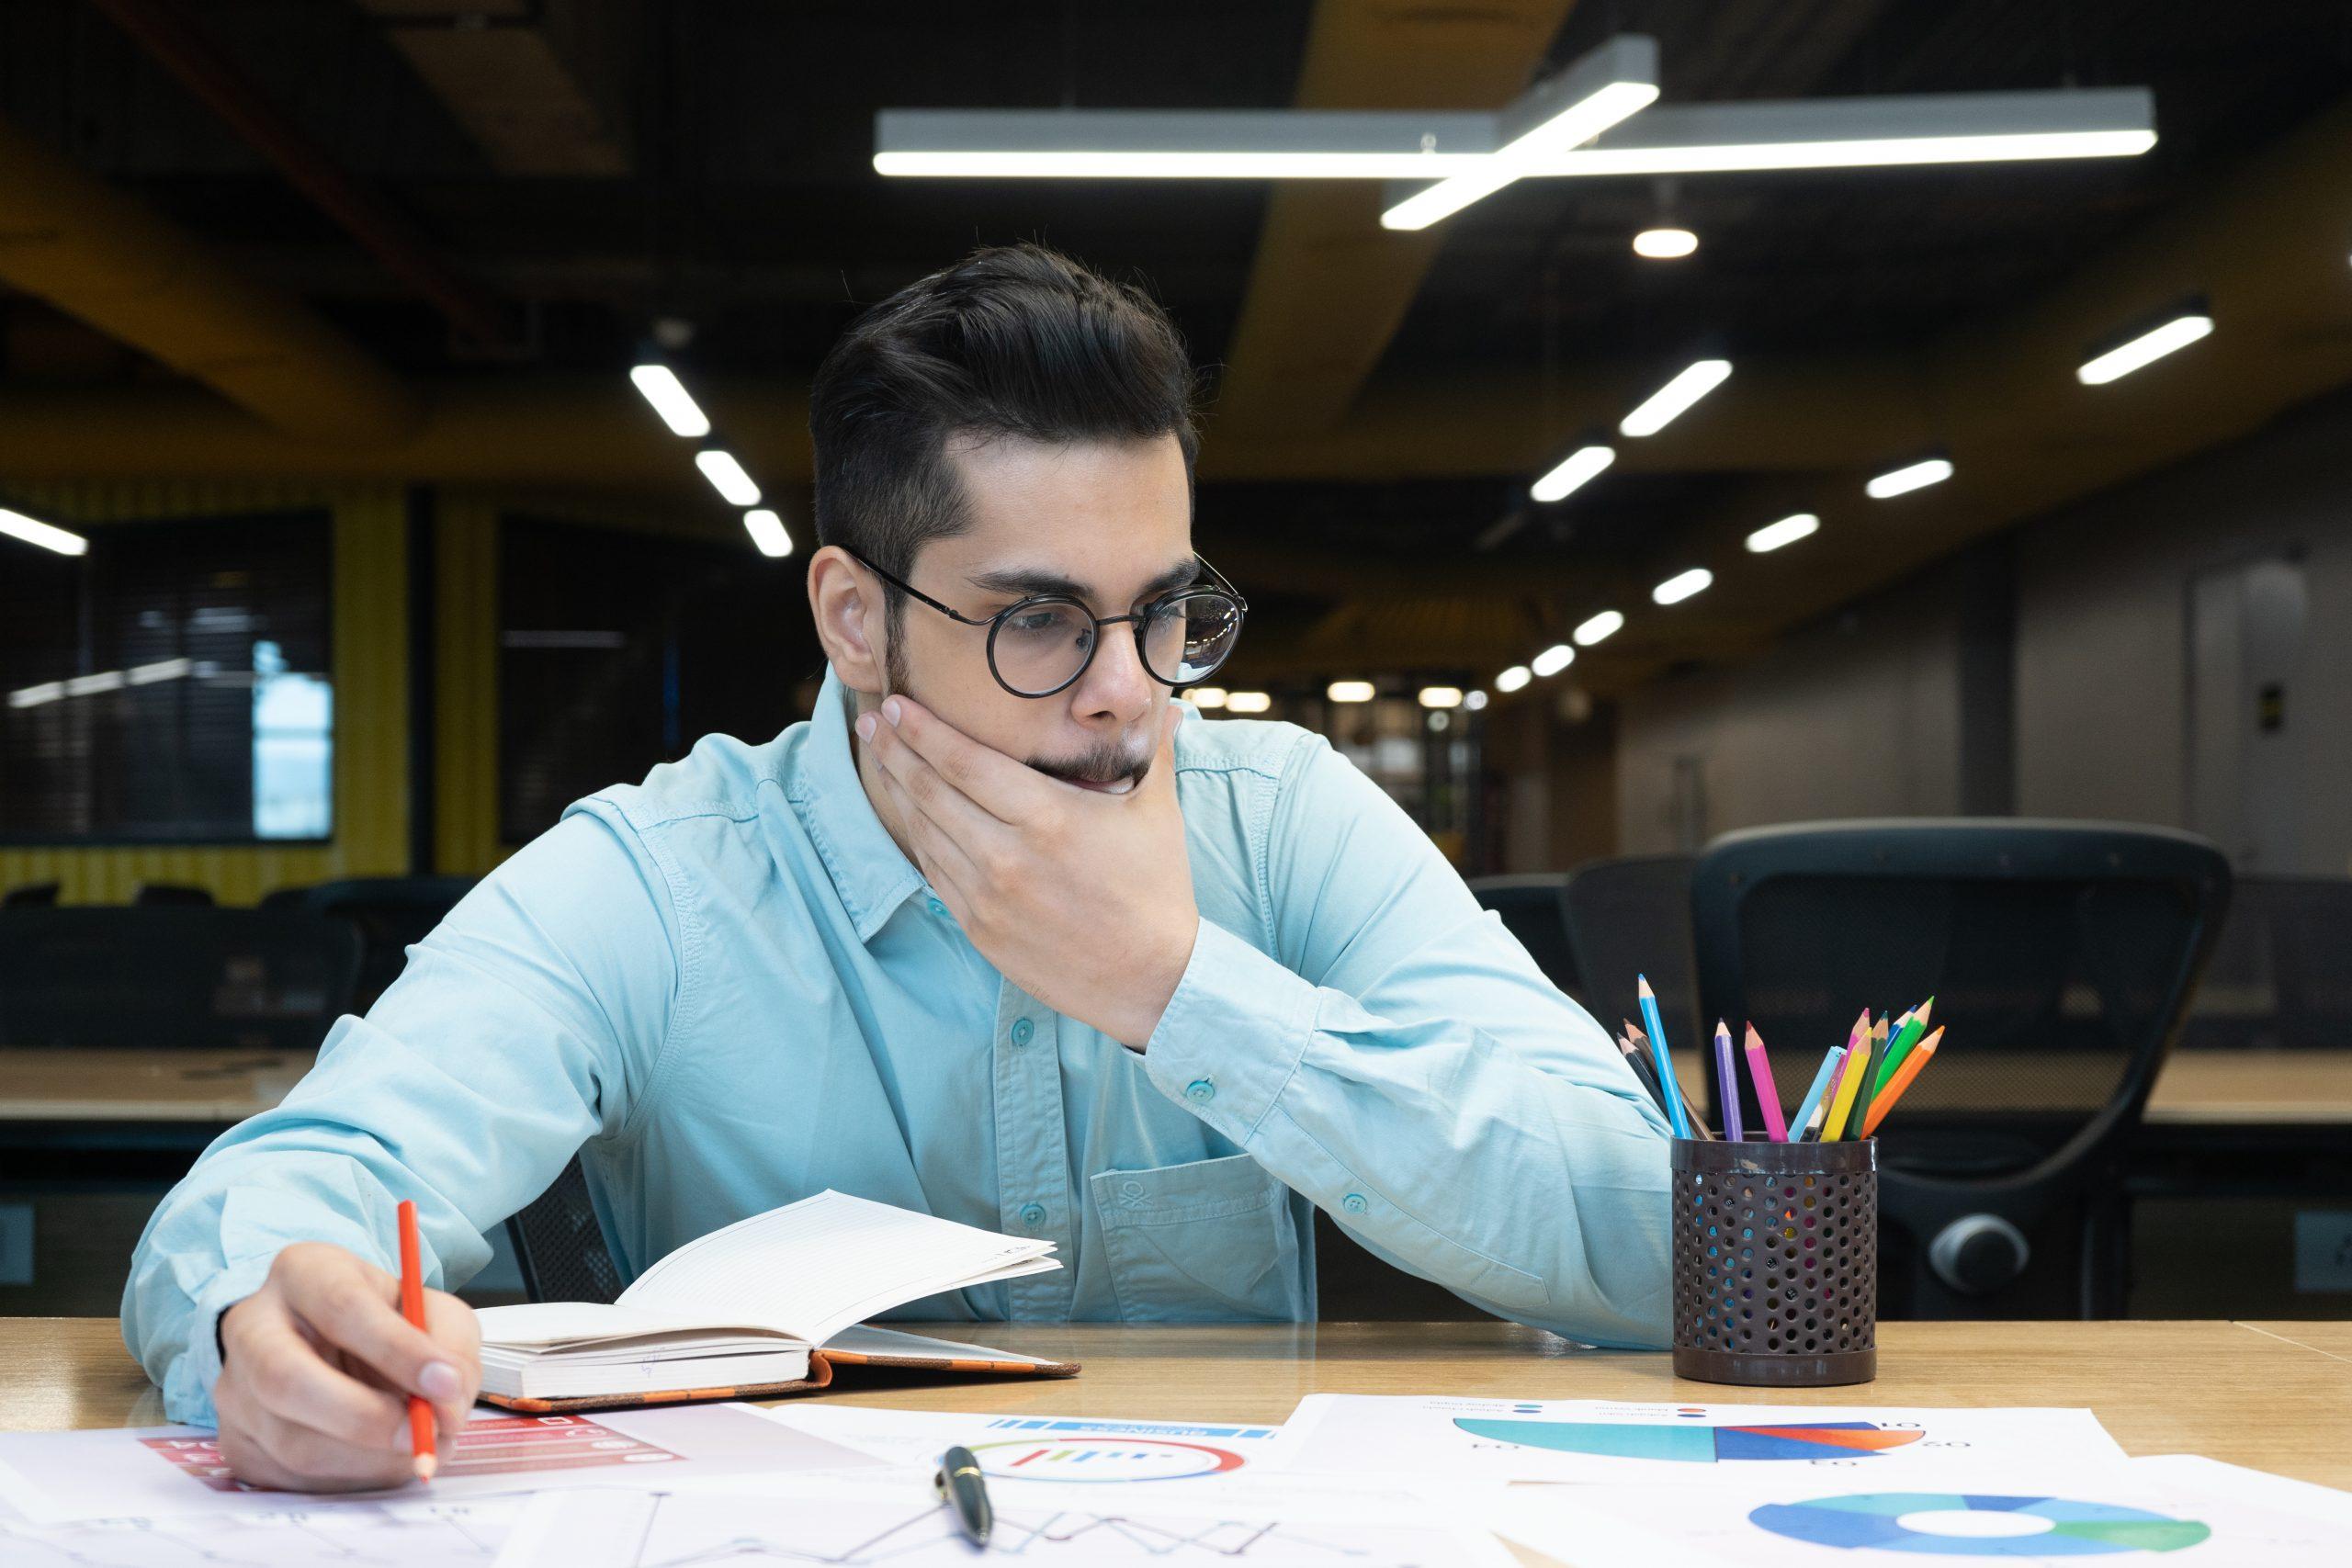 Businessman thinking about work